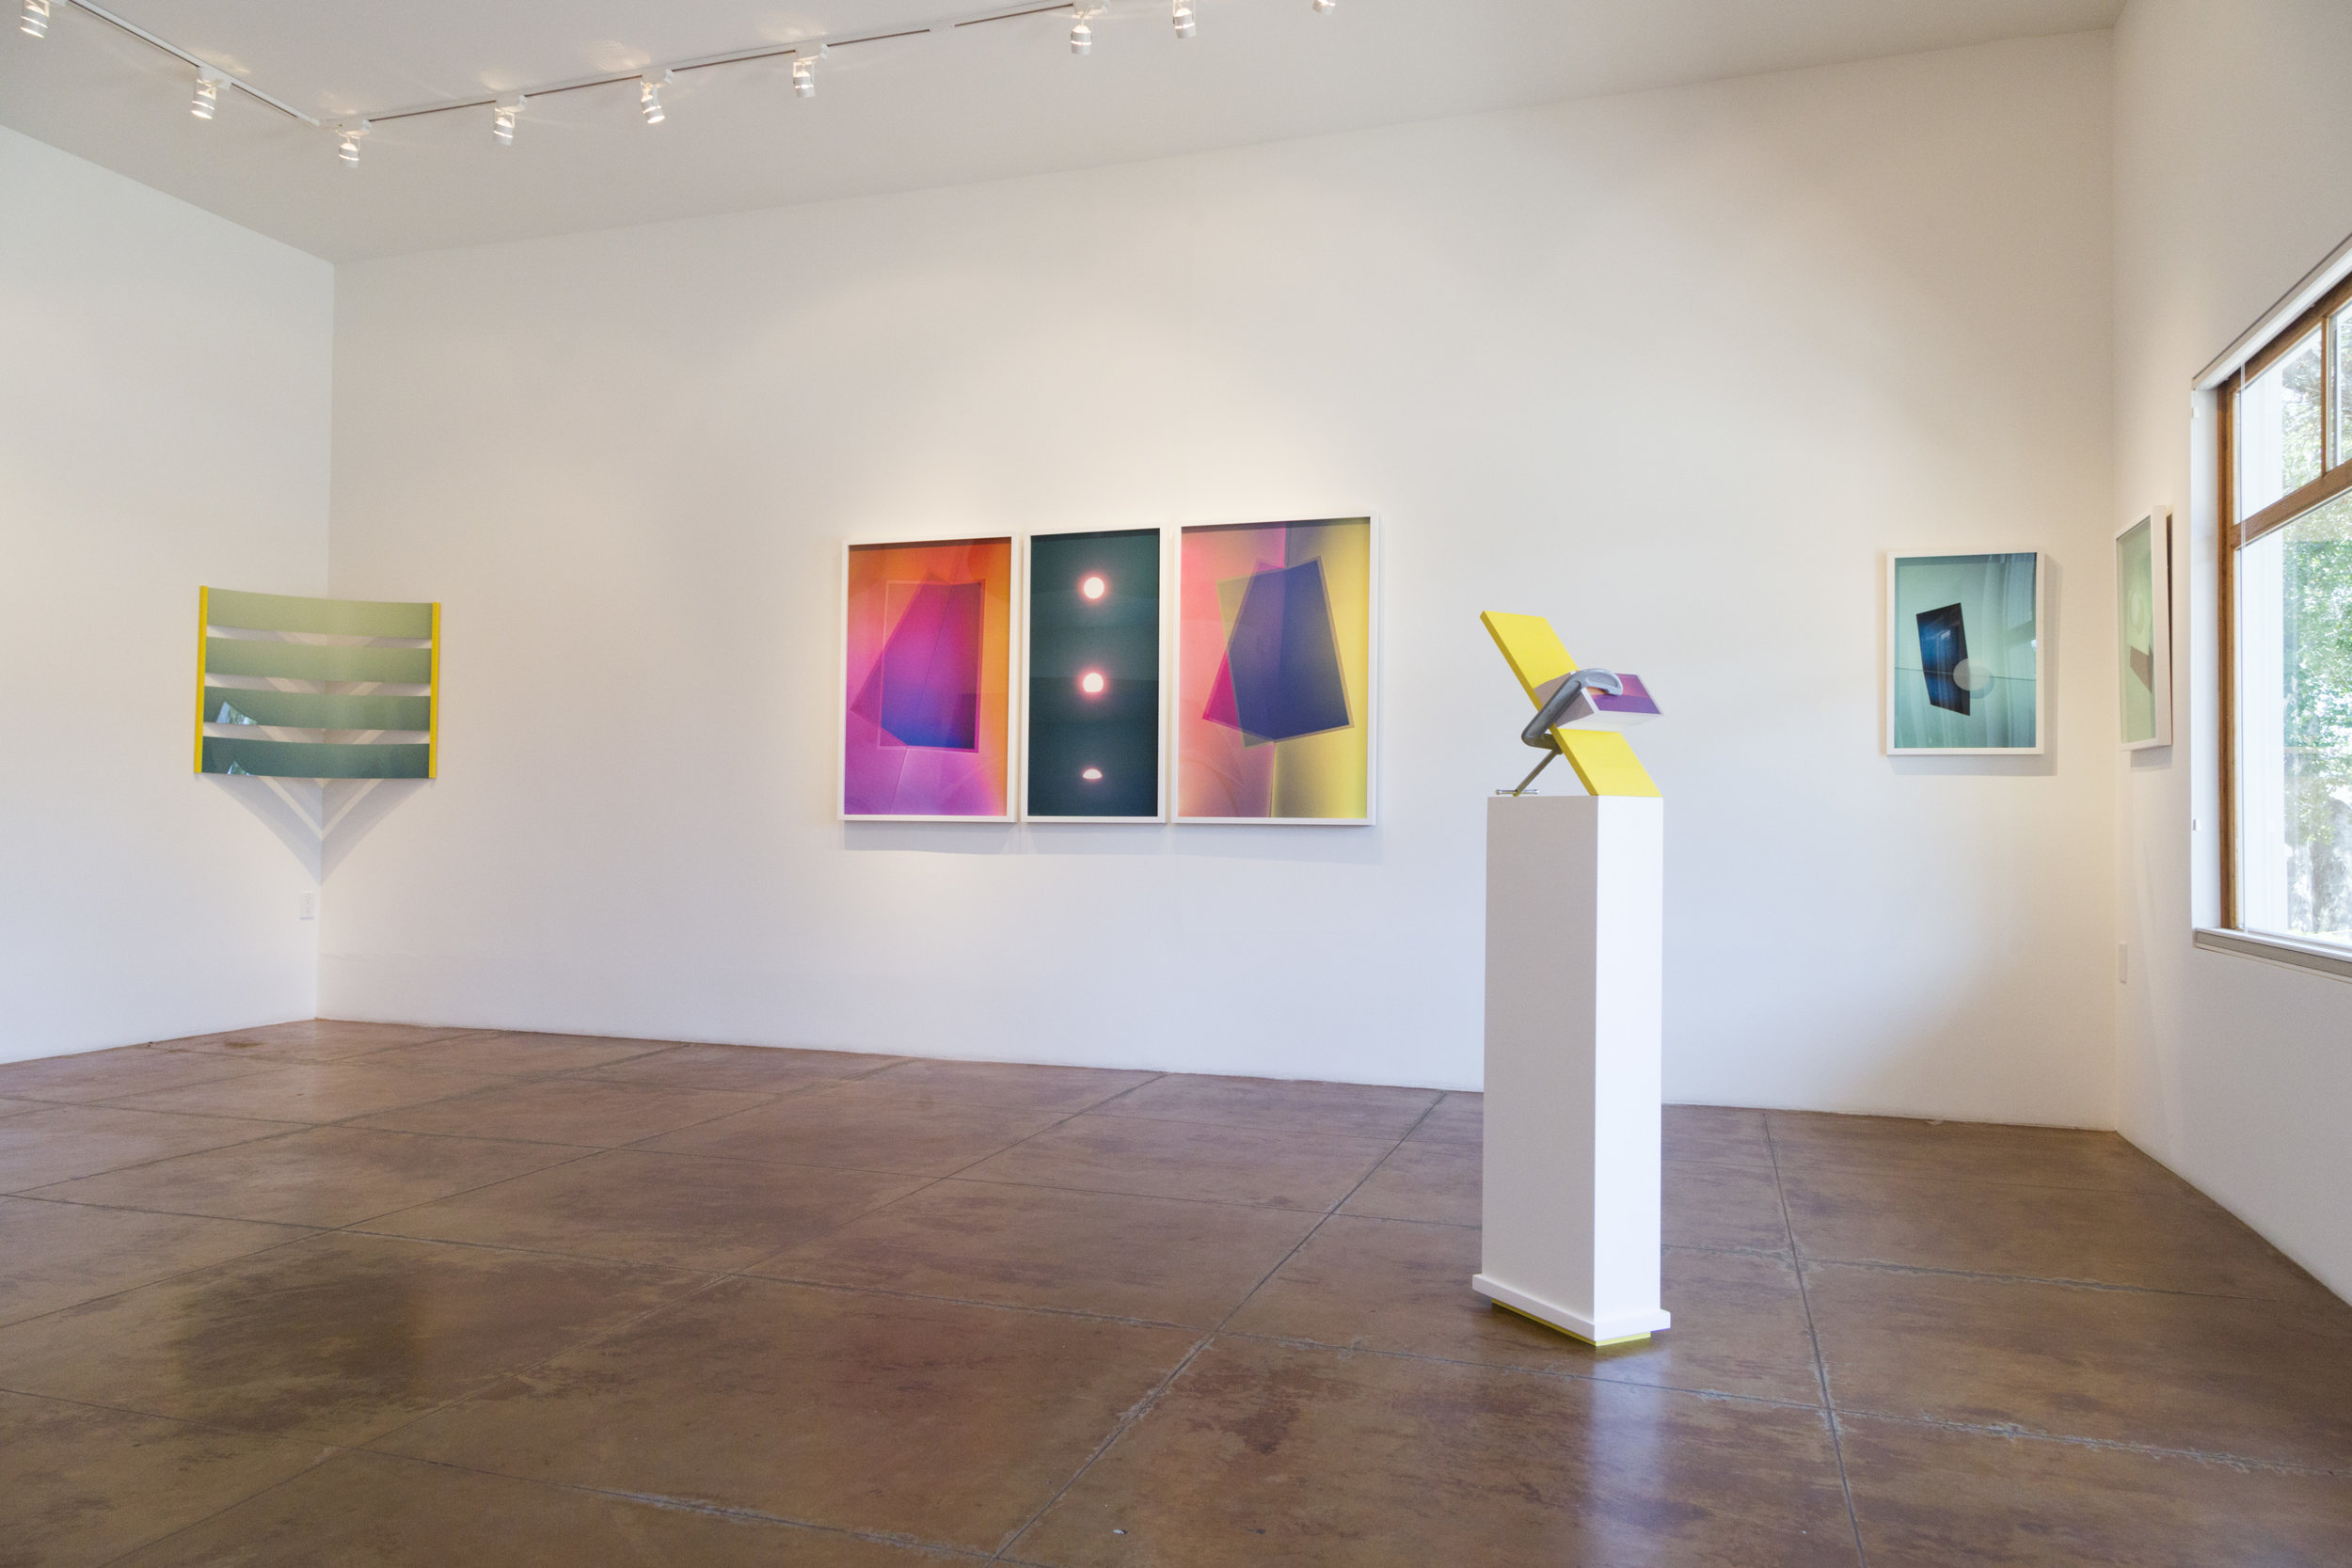 Constant Change - Gallerie 102 - Ojai, CA